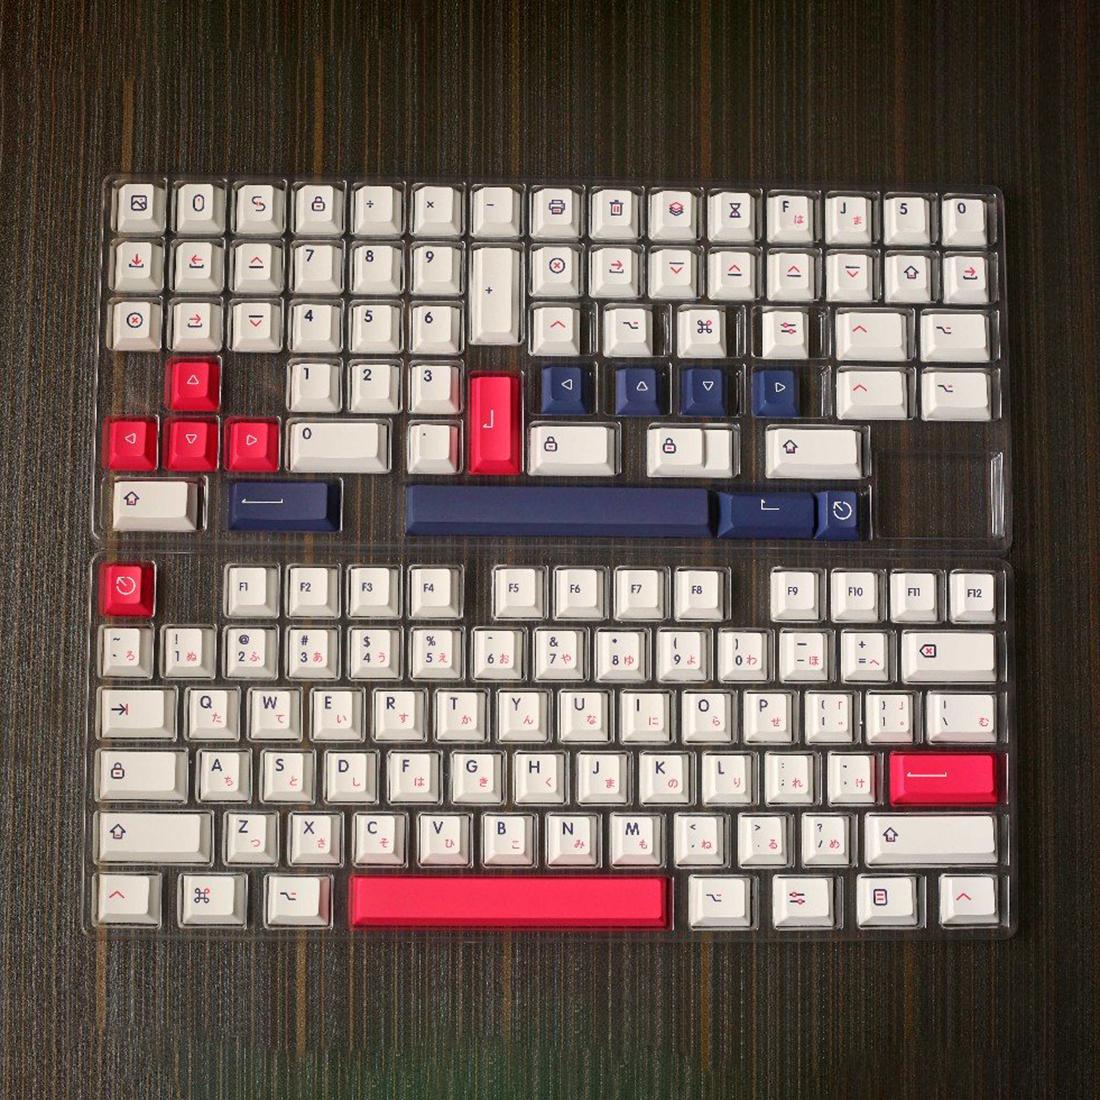 140pcs Japanese Layout Keycaps Set QX2 Profile PBT Dye-sub for 61/87/104 Keys GH60/RK61/Matrix/Joke Custom Gaming Mechanical Keyboard